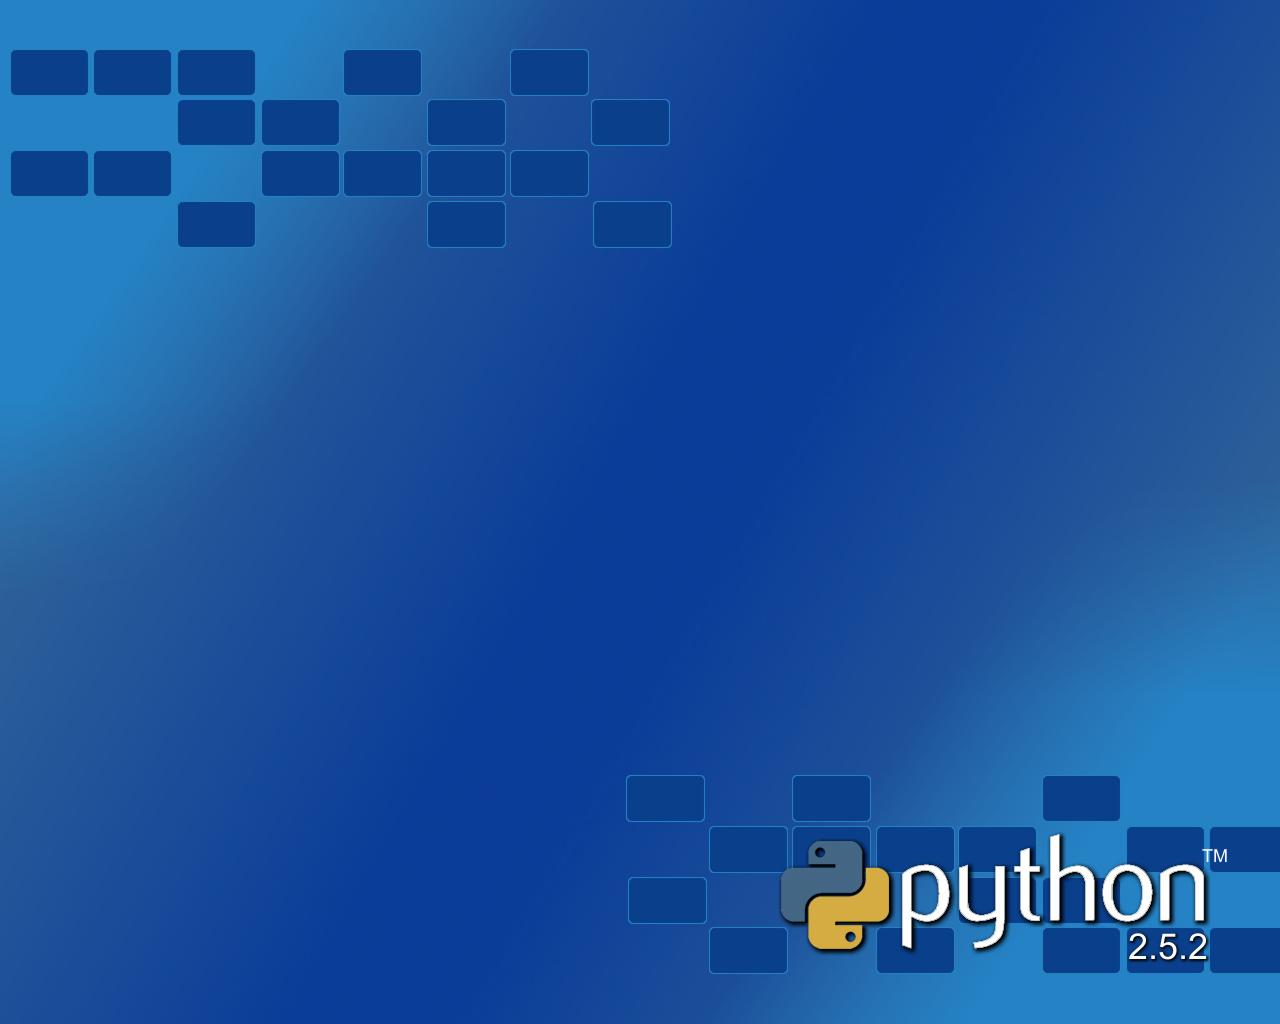 python programming wallpaper